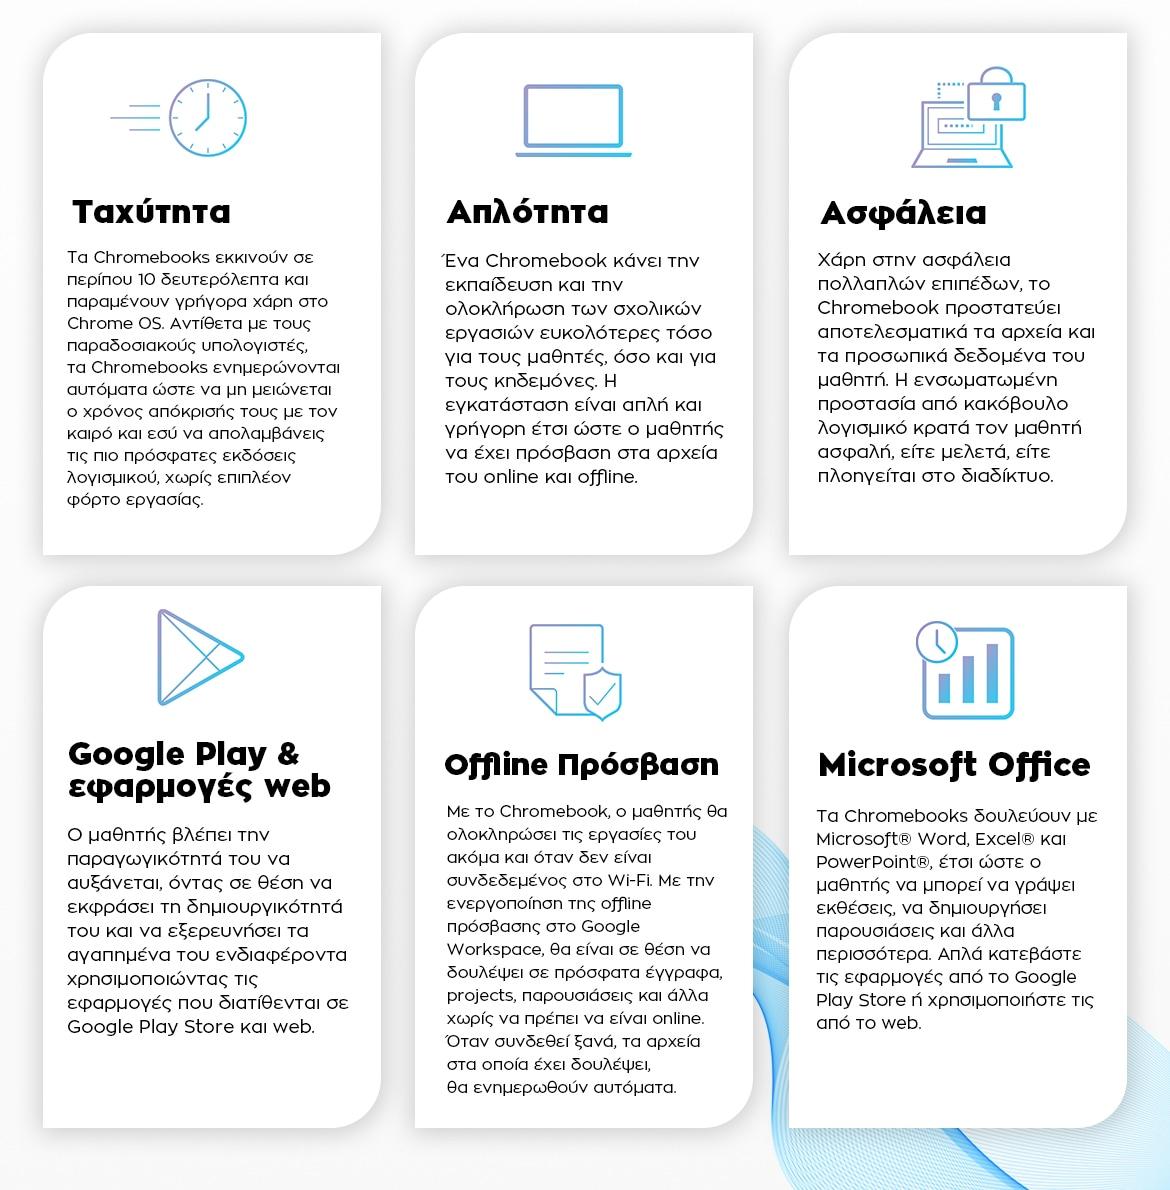 ASUS Chromebook Flip C214 - Ταχύτητα, Απλότητα, Ασφάλεια, Google Play & εφαρμογές web, Offline Πρόσβαση, Microsoft Office